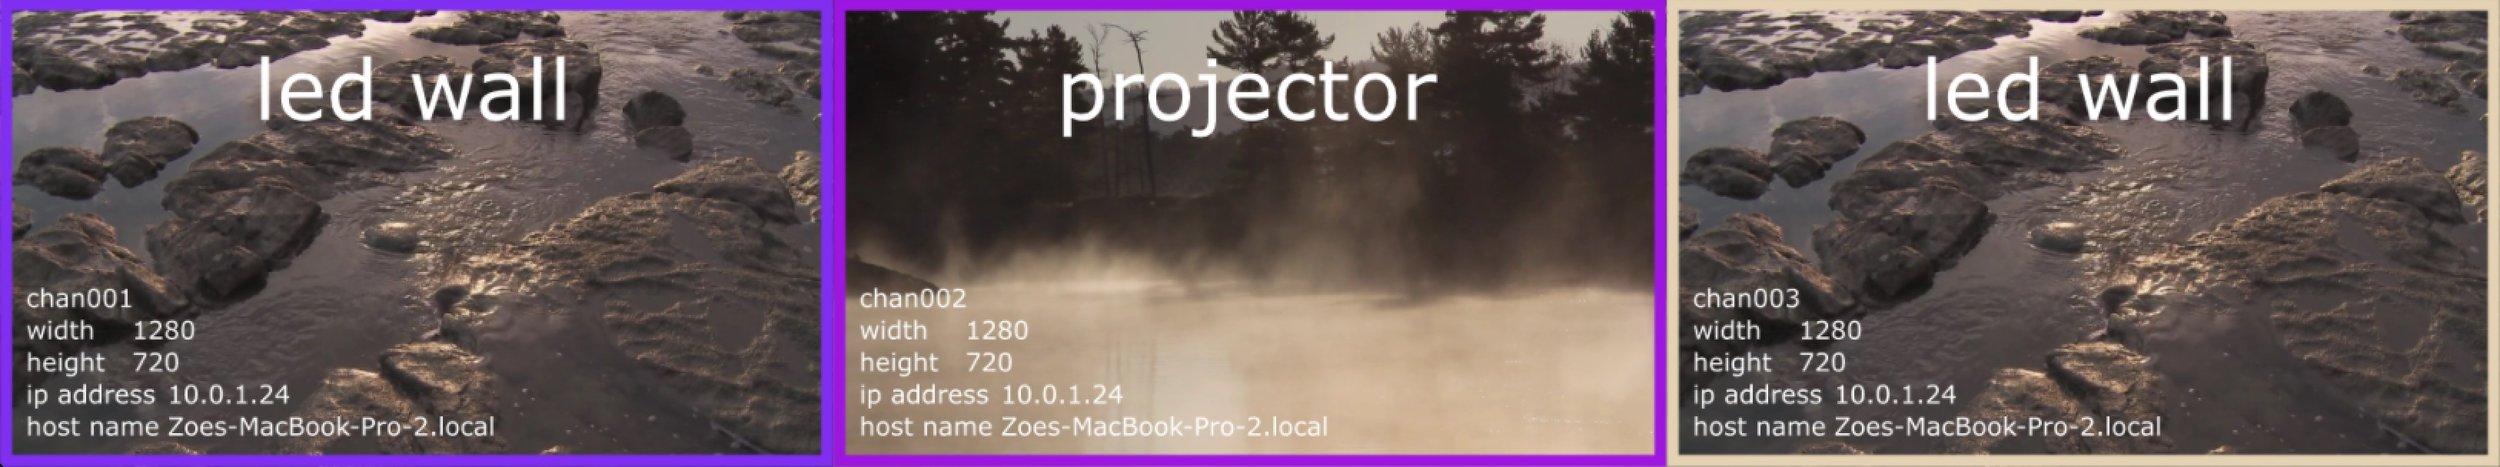 Screen Shot 2019-08-14 at 12.50.07 PM.JPG